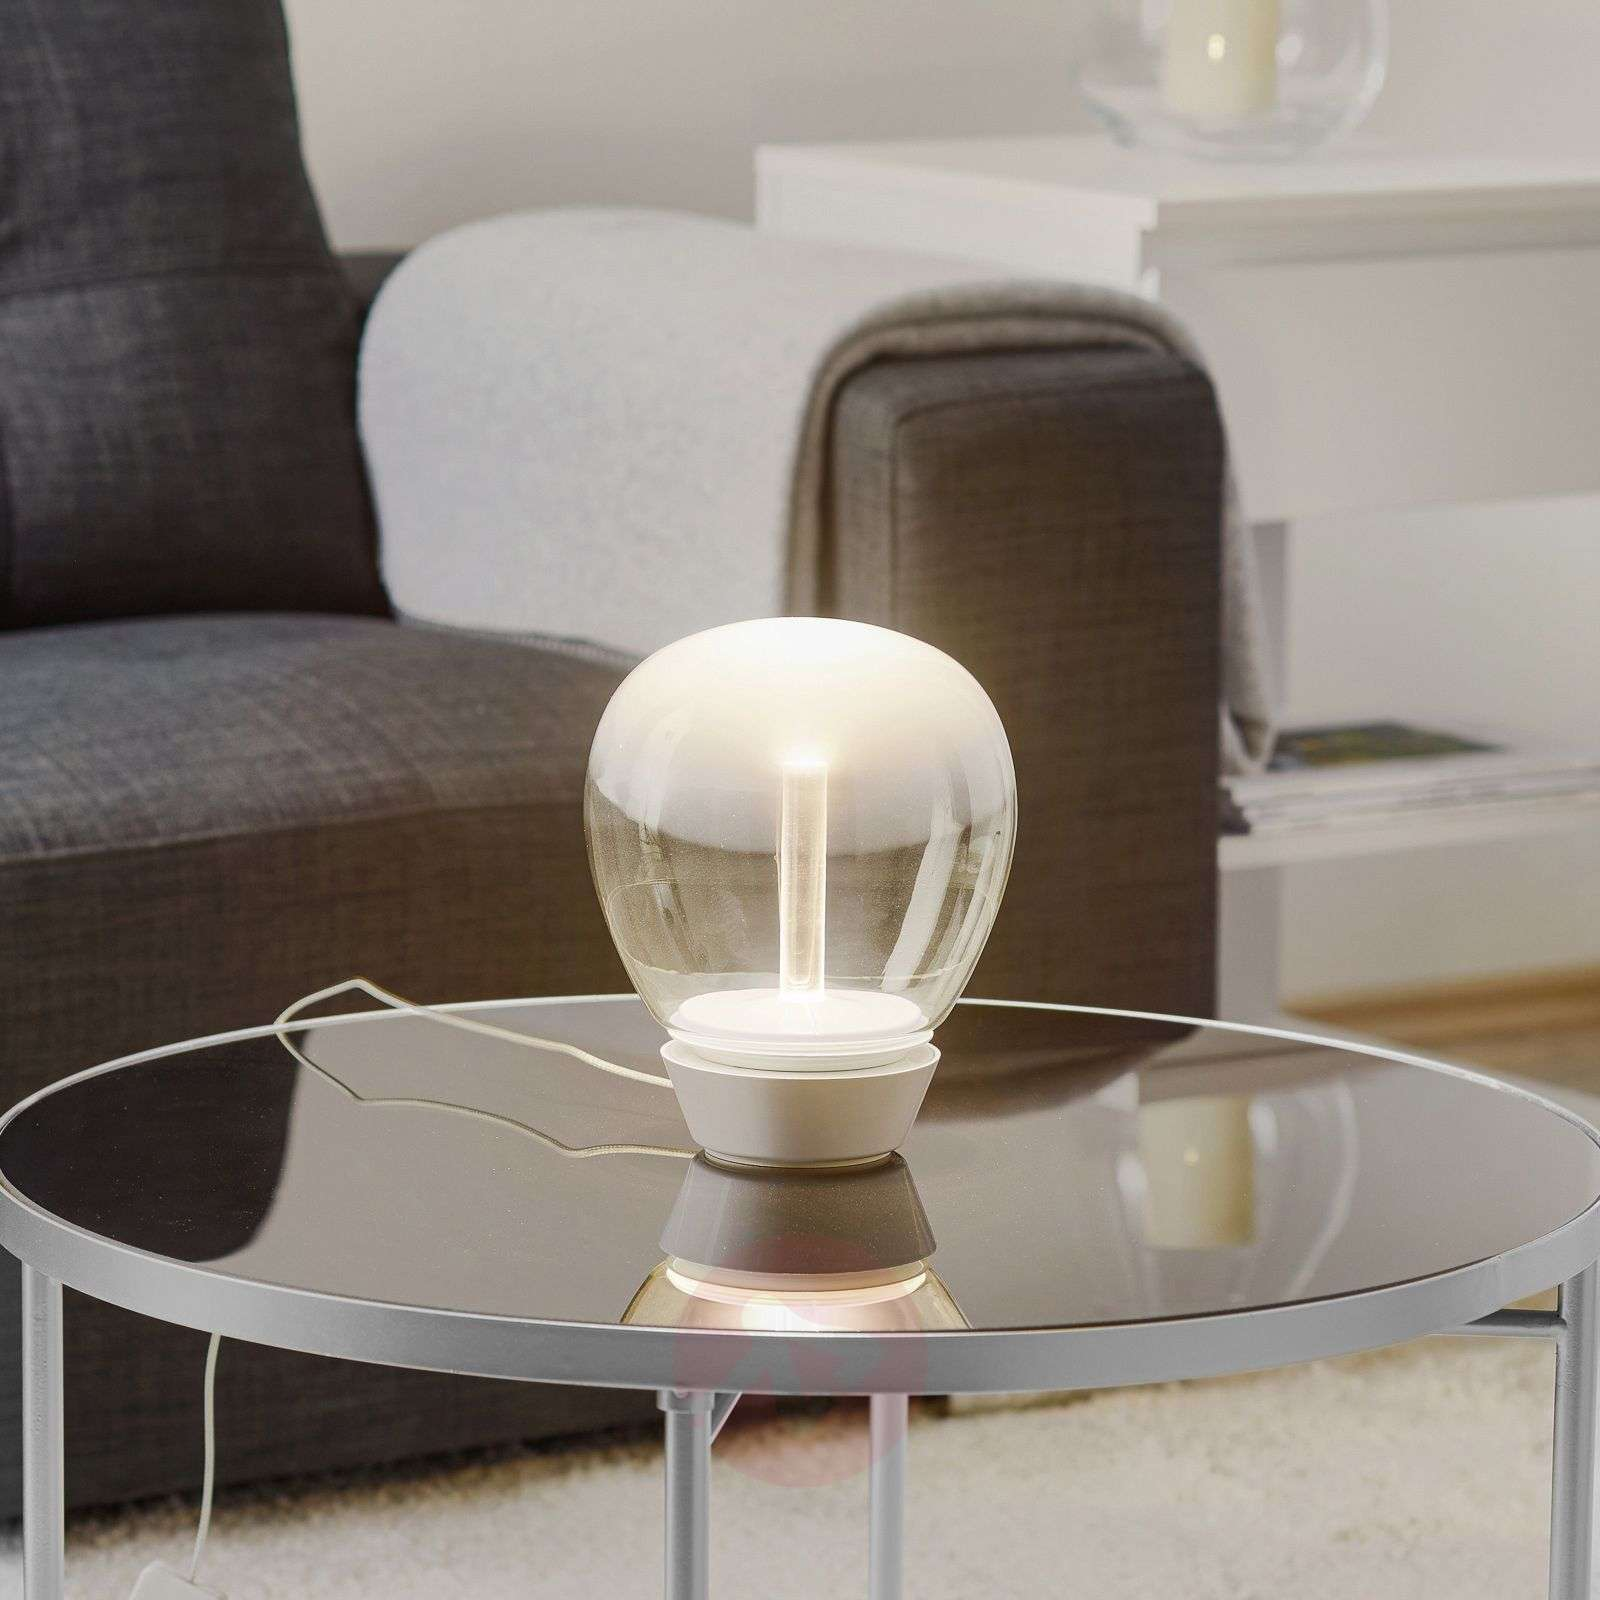 Empatia designer LED desk lamp, 16 cm-1060040-01